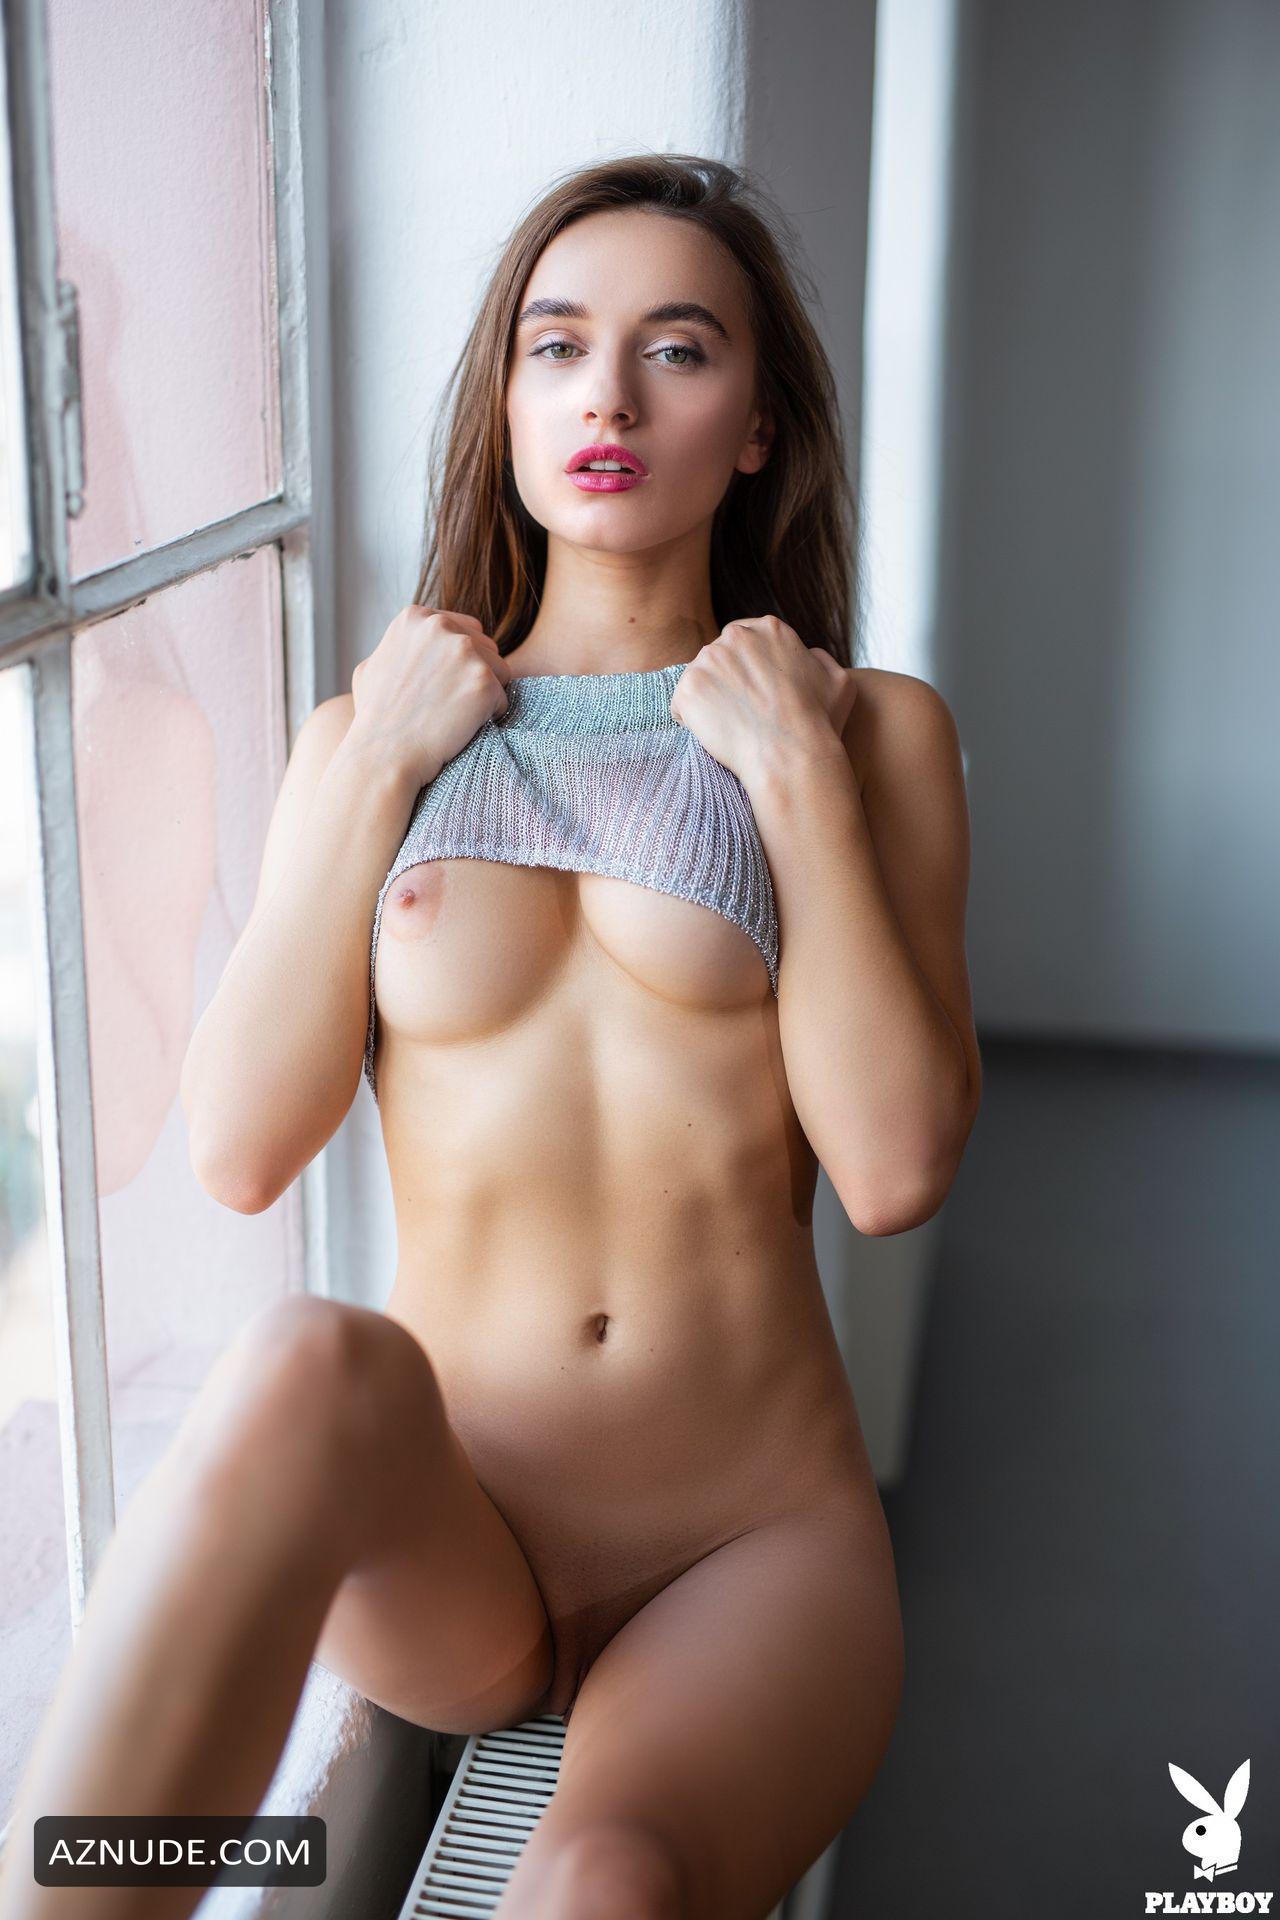 Naked Sofia Vergara Nude Magazine Gif